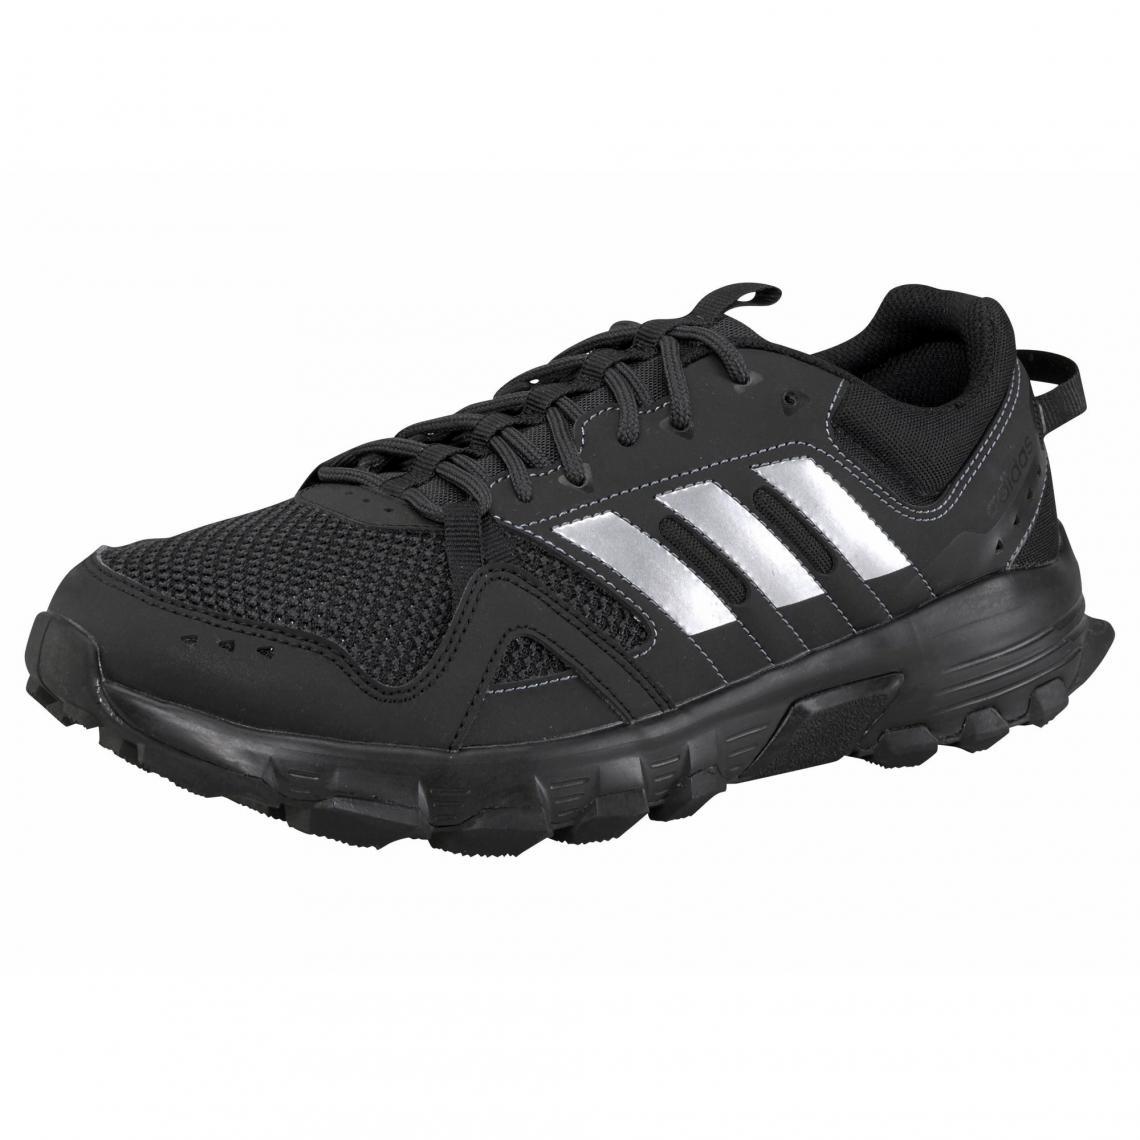 official photos 1e145 85d86 adidas Rockadia Trail chaussures de running homme - Noir - Blanc Adidas  Homme